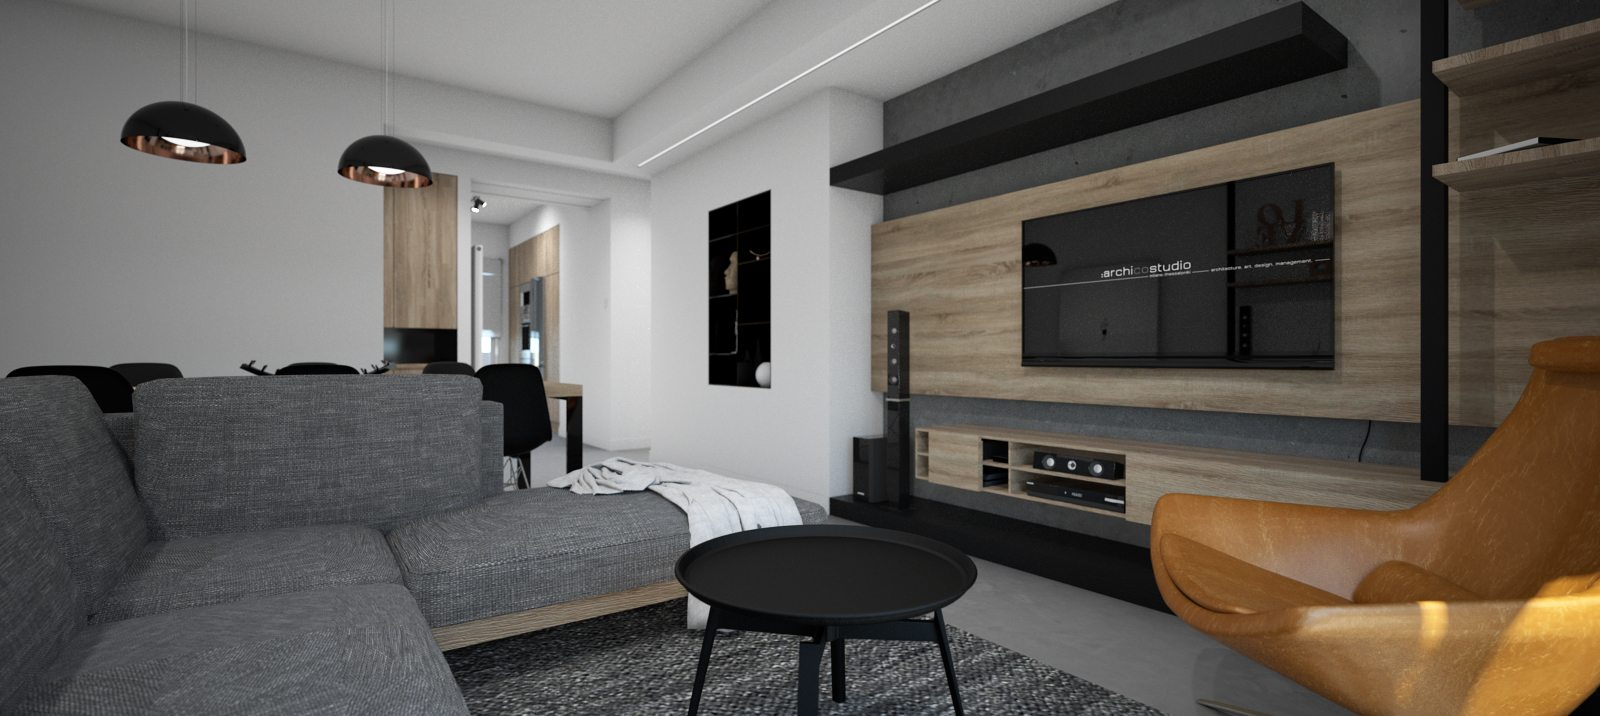 archicostudio_house-ts05_livingroom2